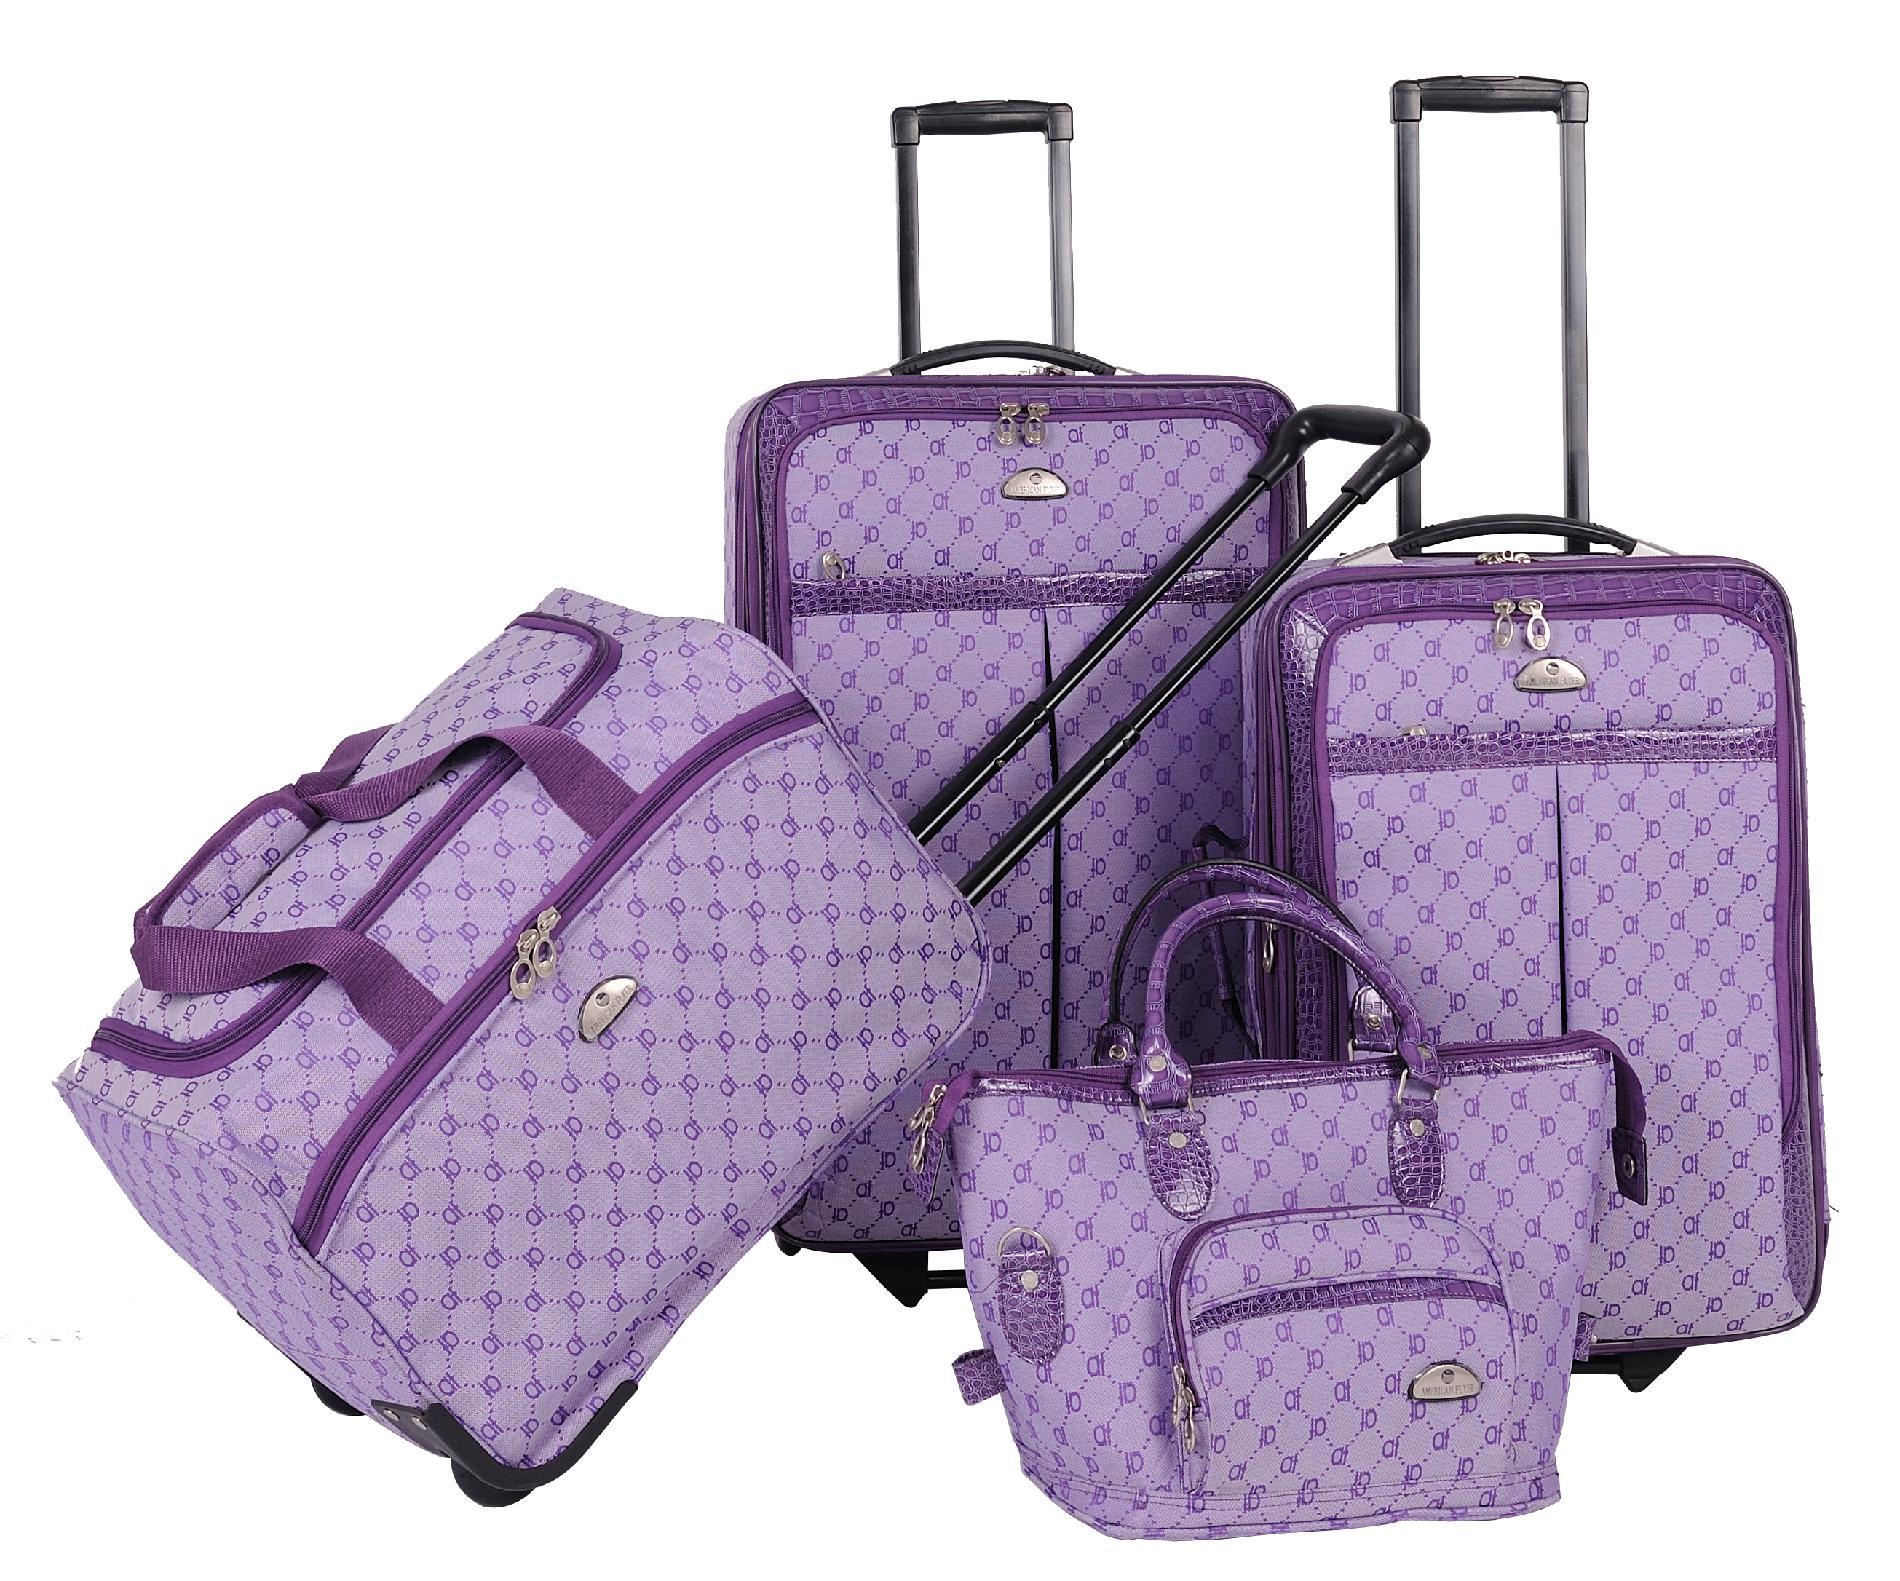 American Flyer Signature 4-Piece Luggage Set,  Light Purple